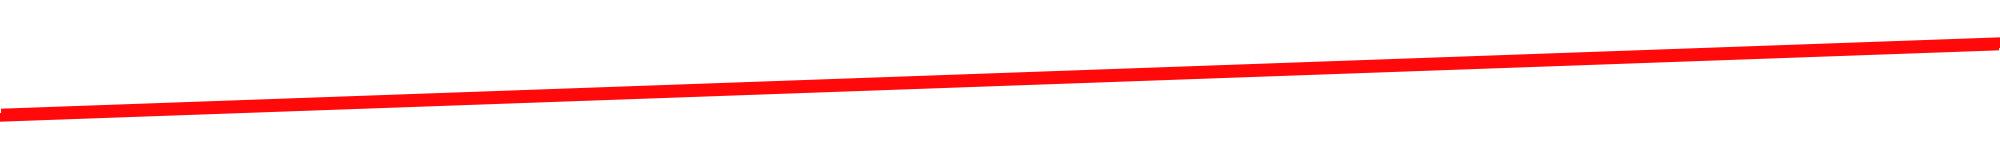 rødstrek2.jpg